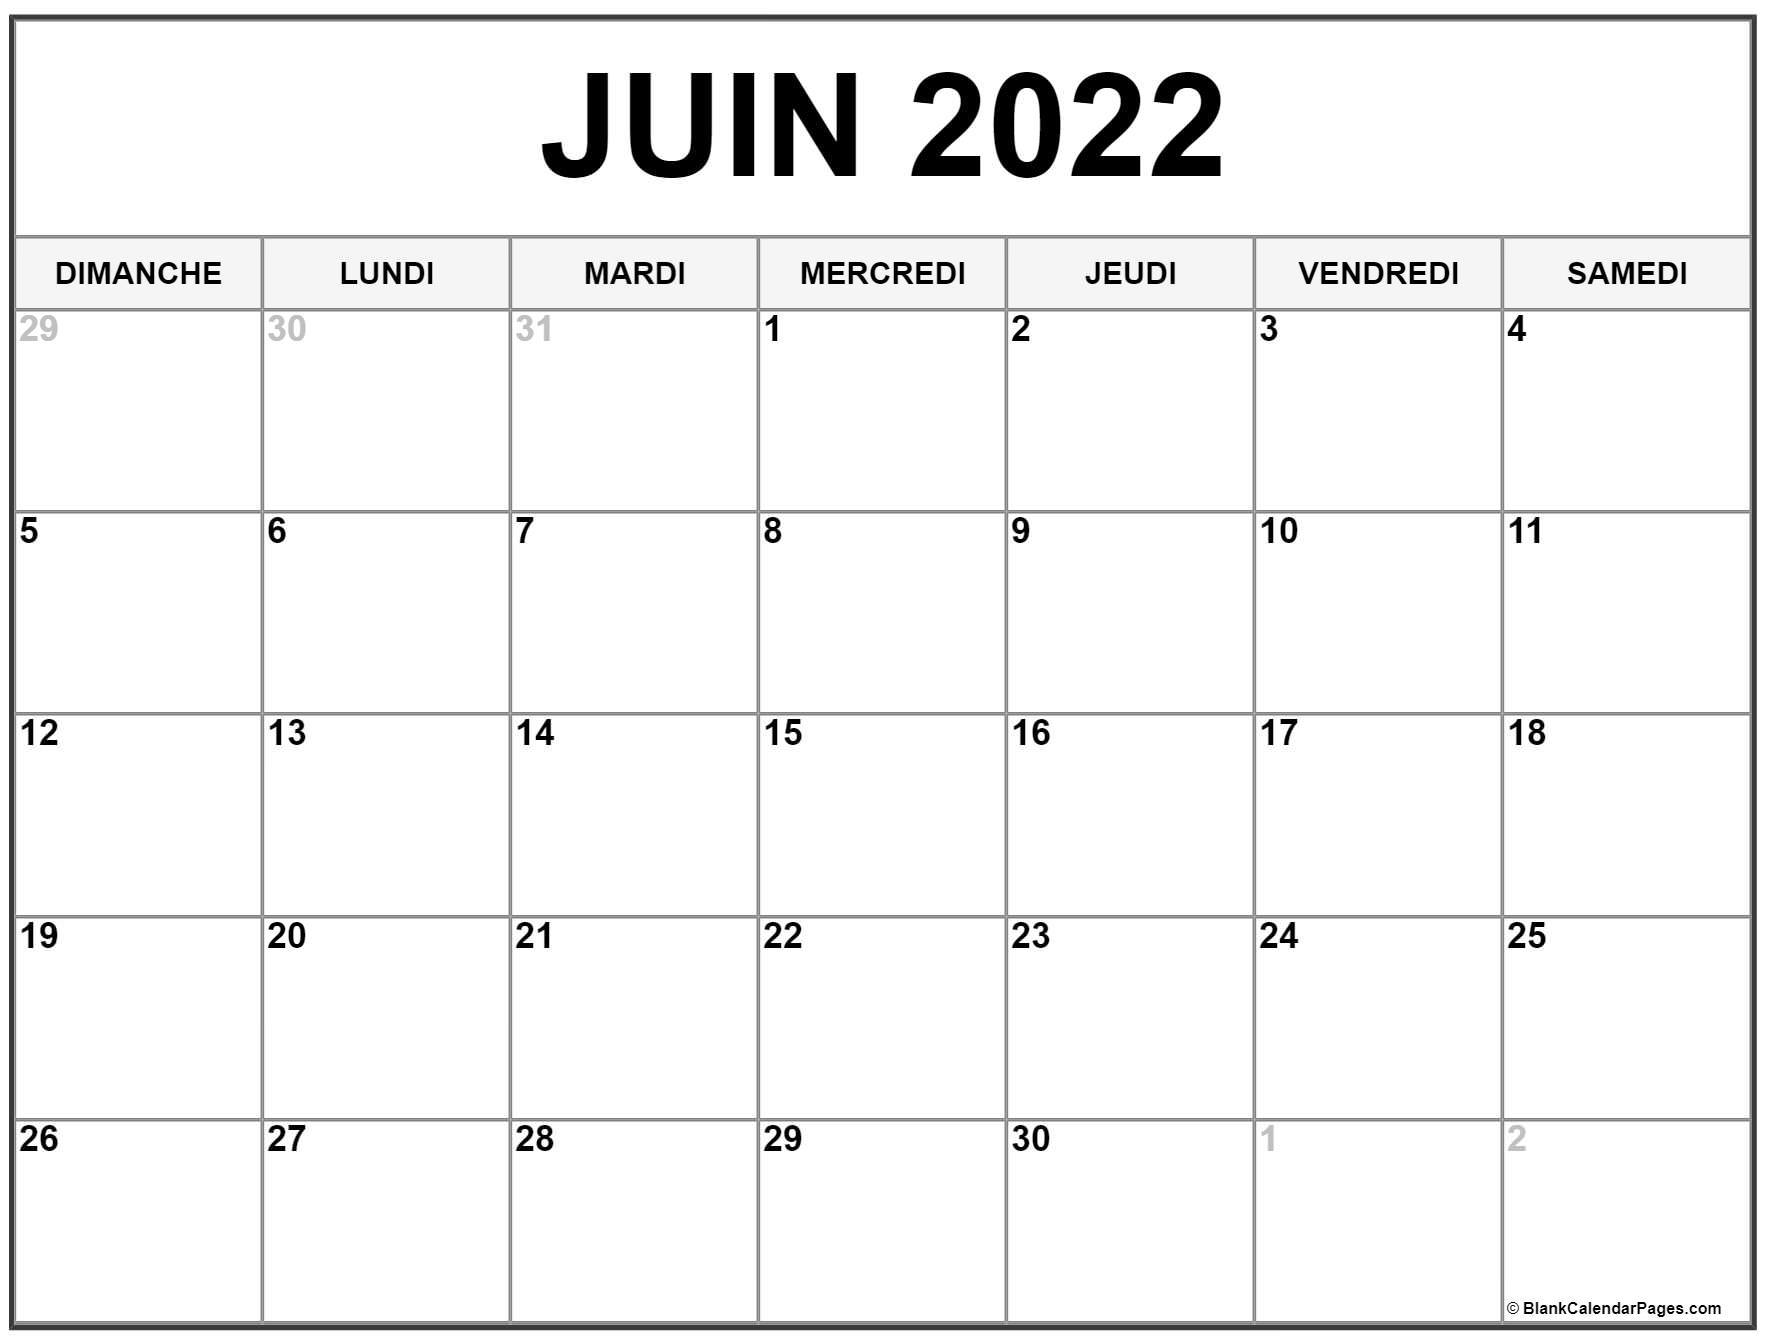 Calendrier 2022 Juin juin 2022 calendrier imprimable   Calendrier gratuit